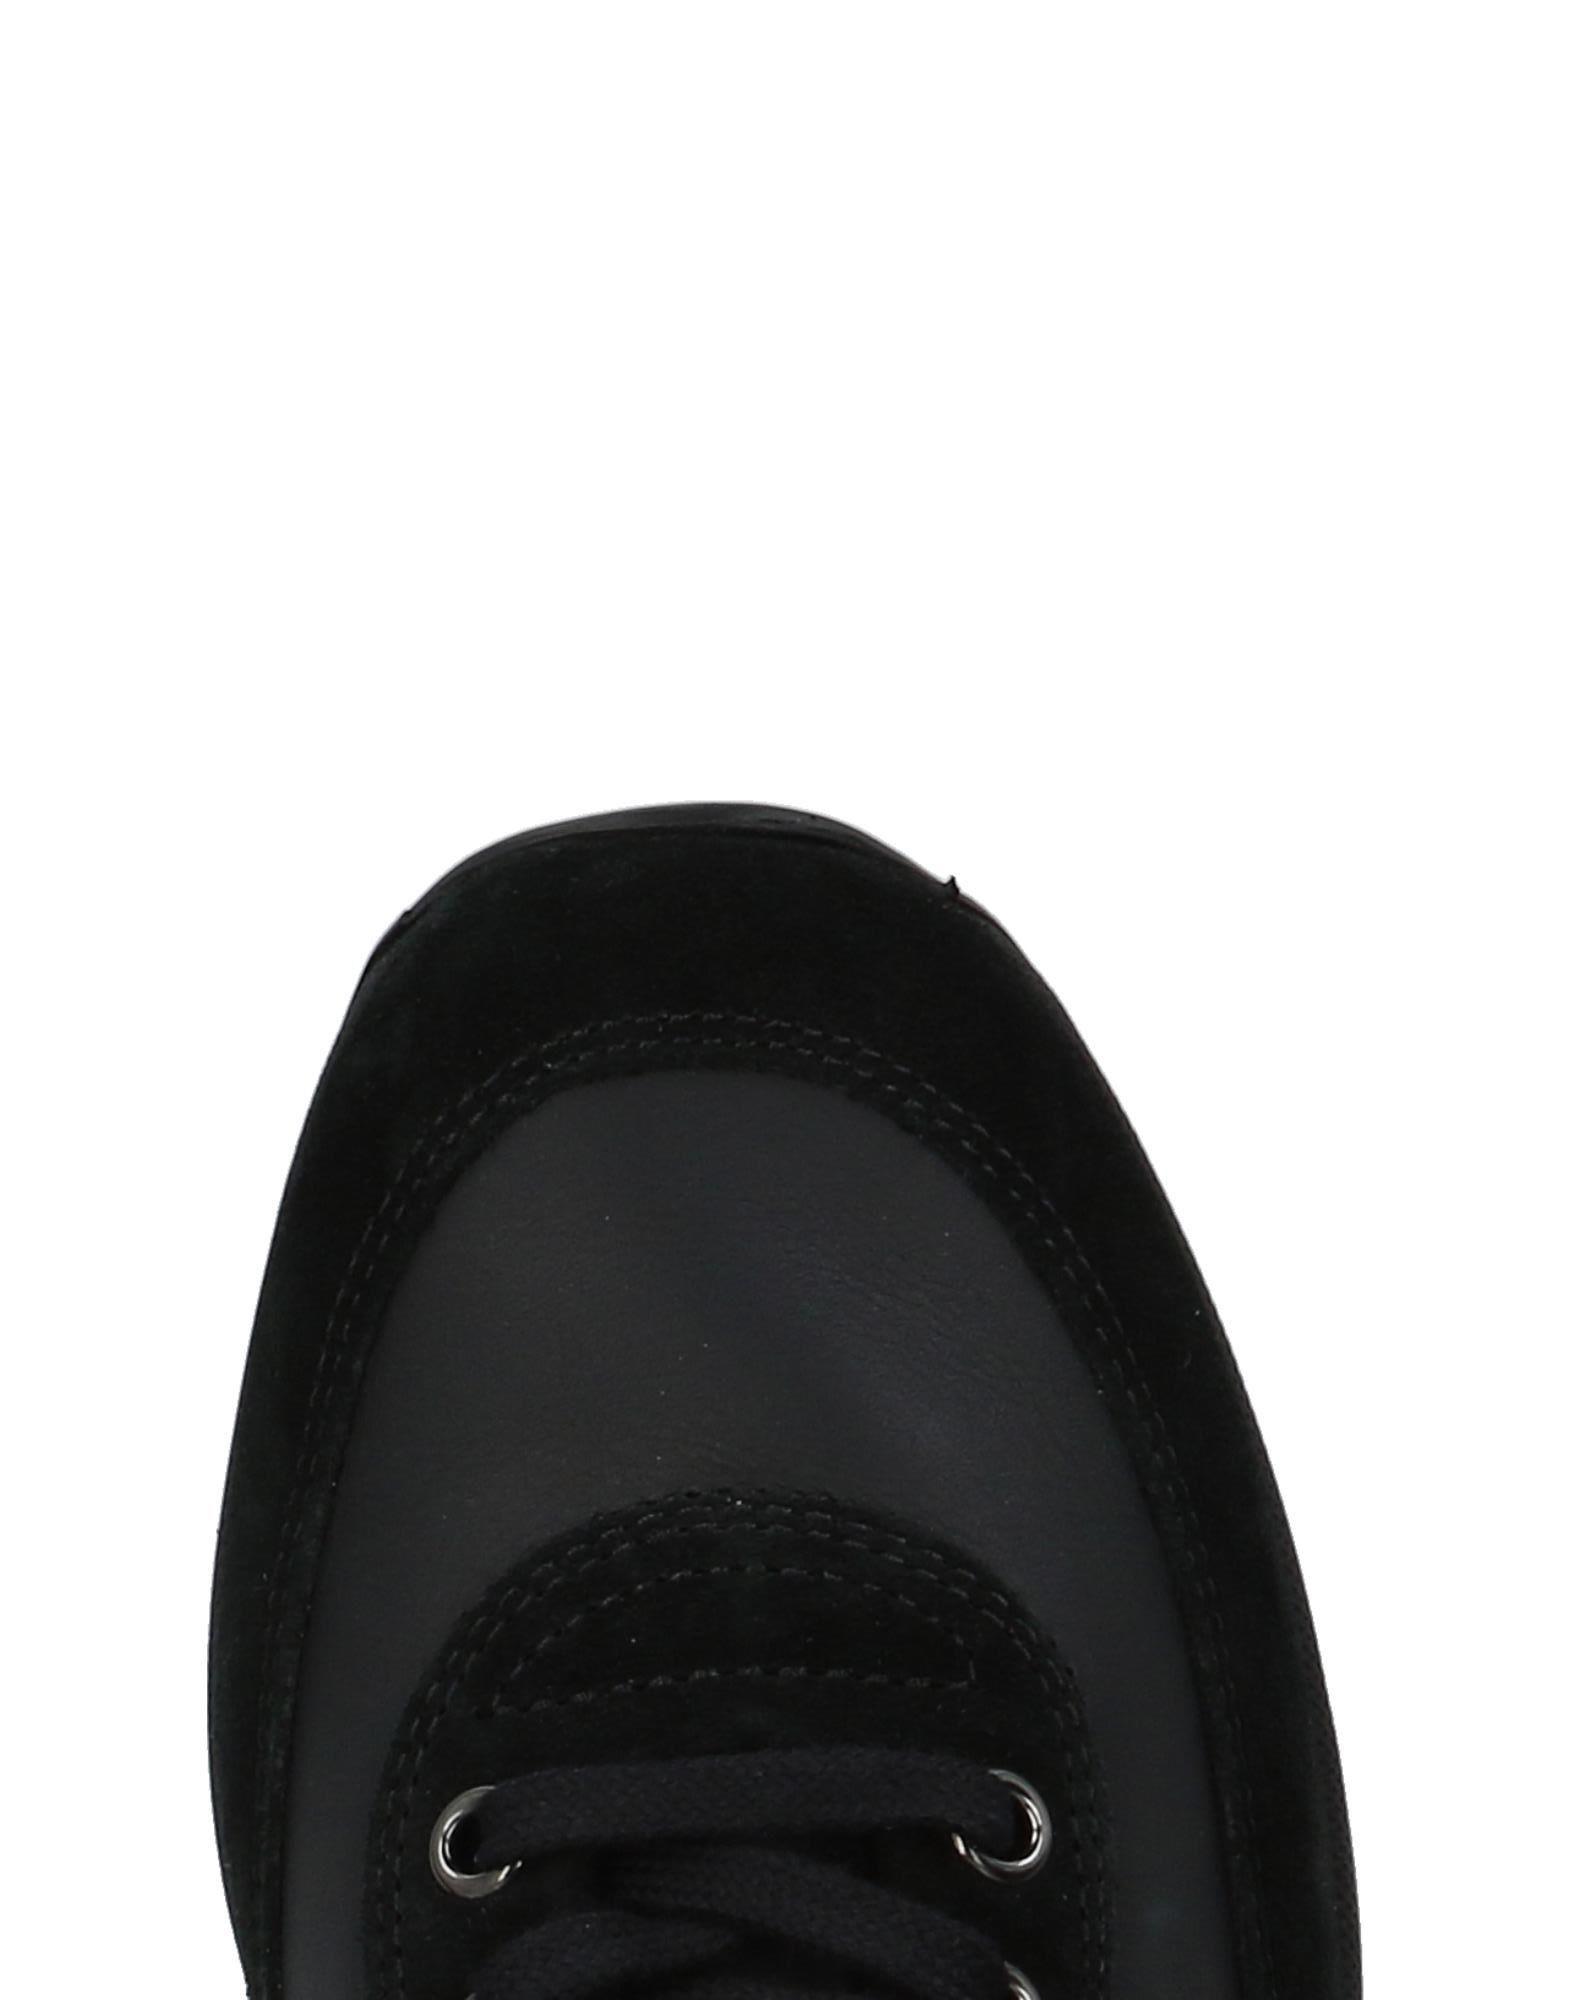 promo code d8548 e5466 ... Gris Zapatillas Agile By Rucoline Mujer - - - Zapatillas Agile By  Rucoline Los zapatos más